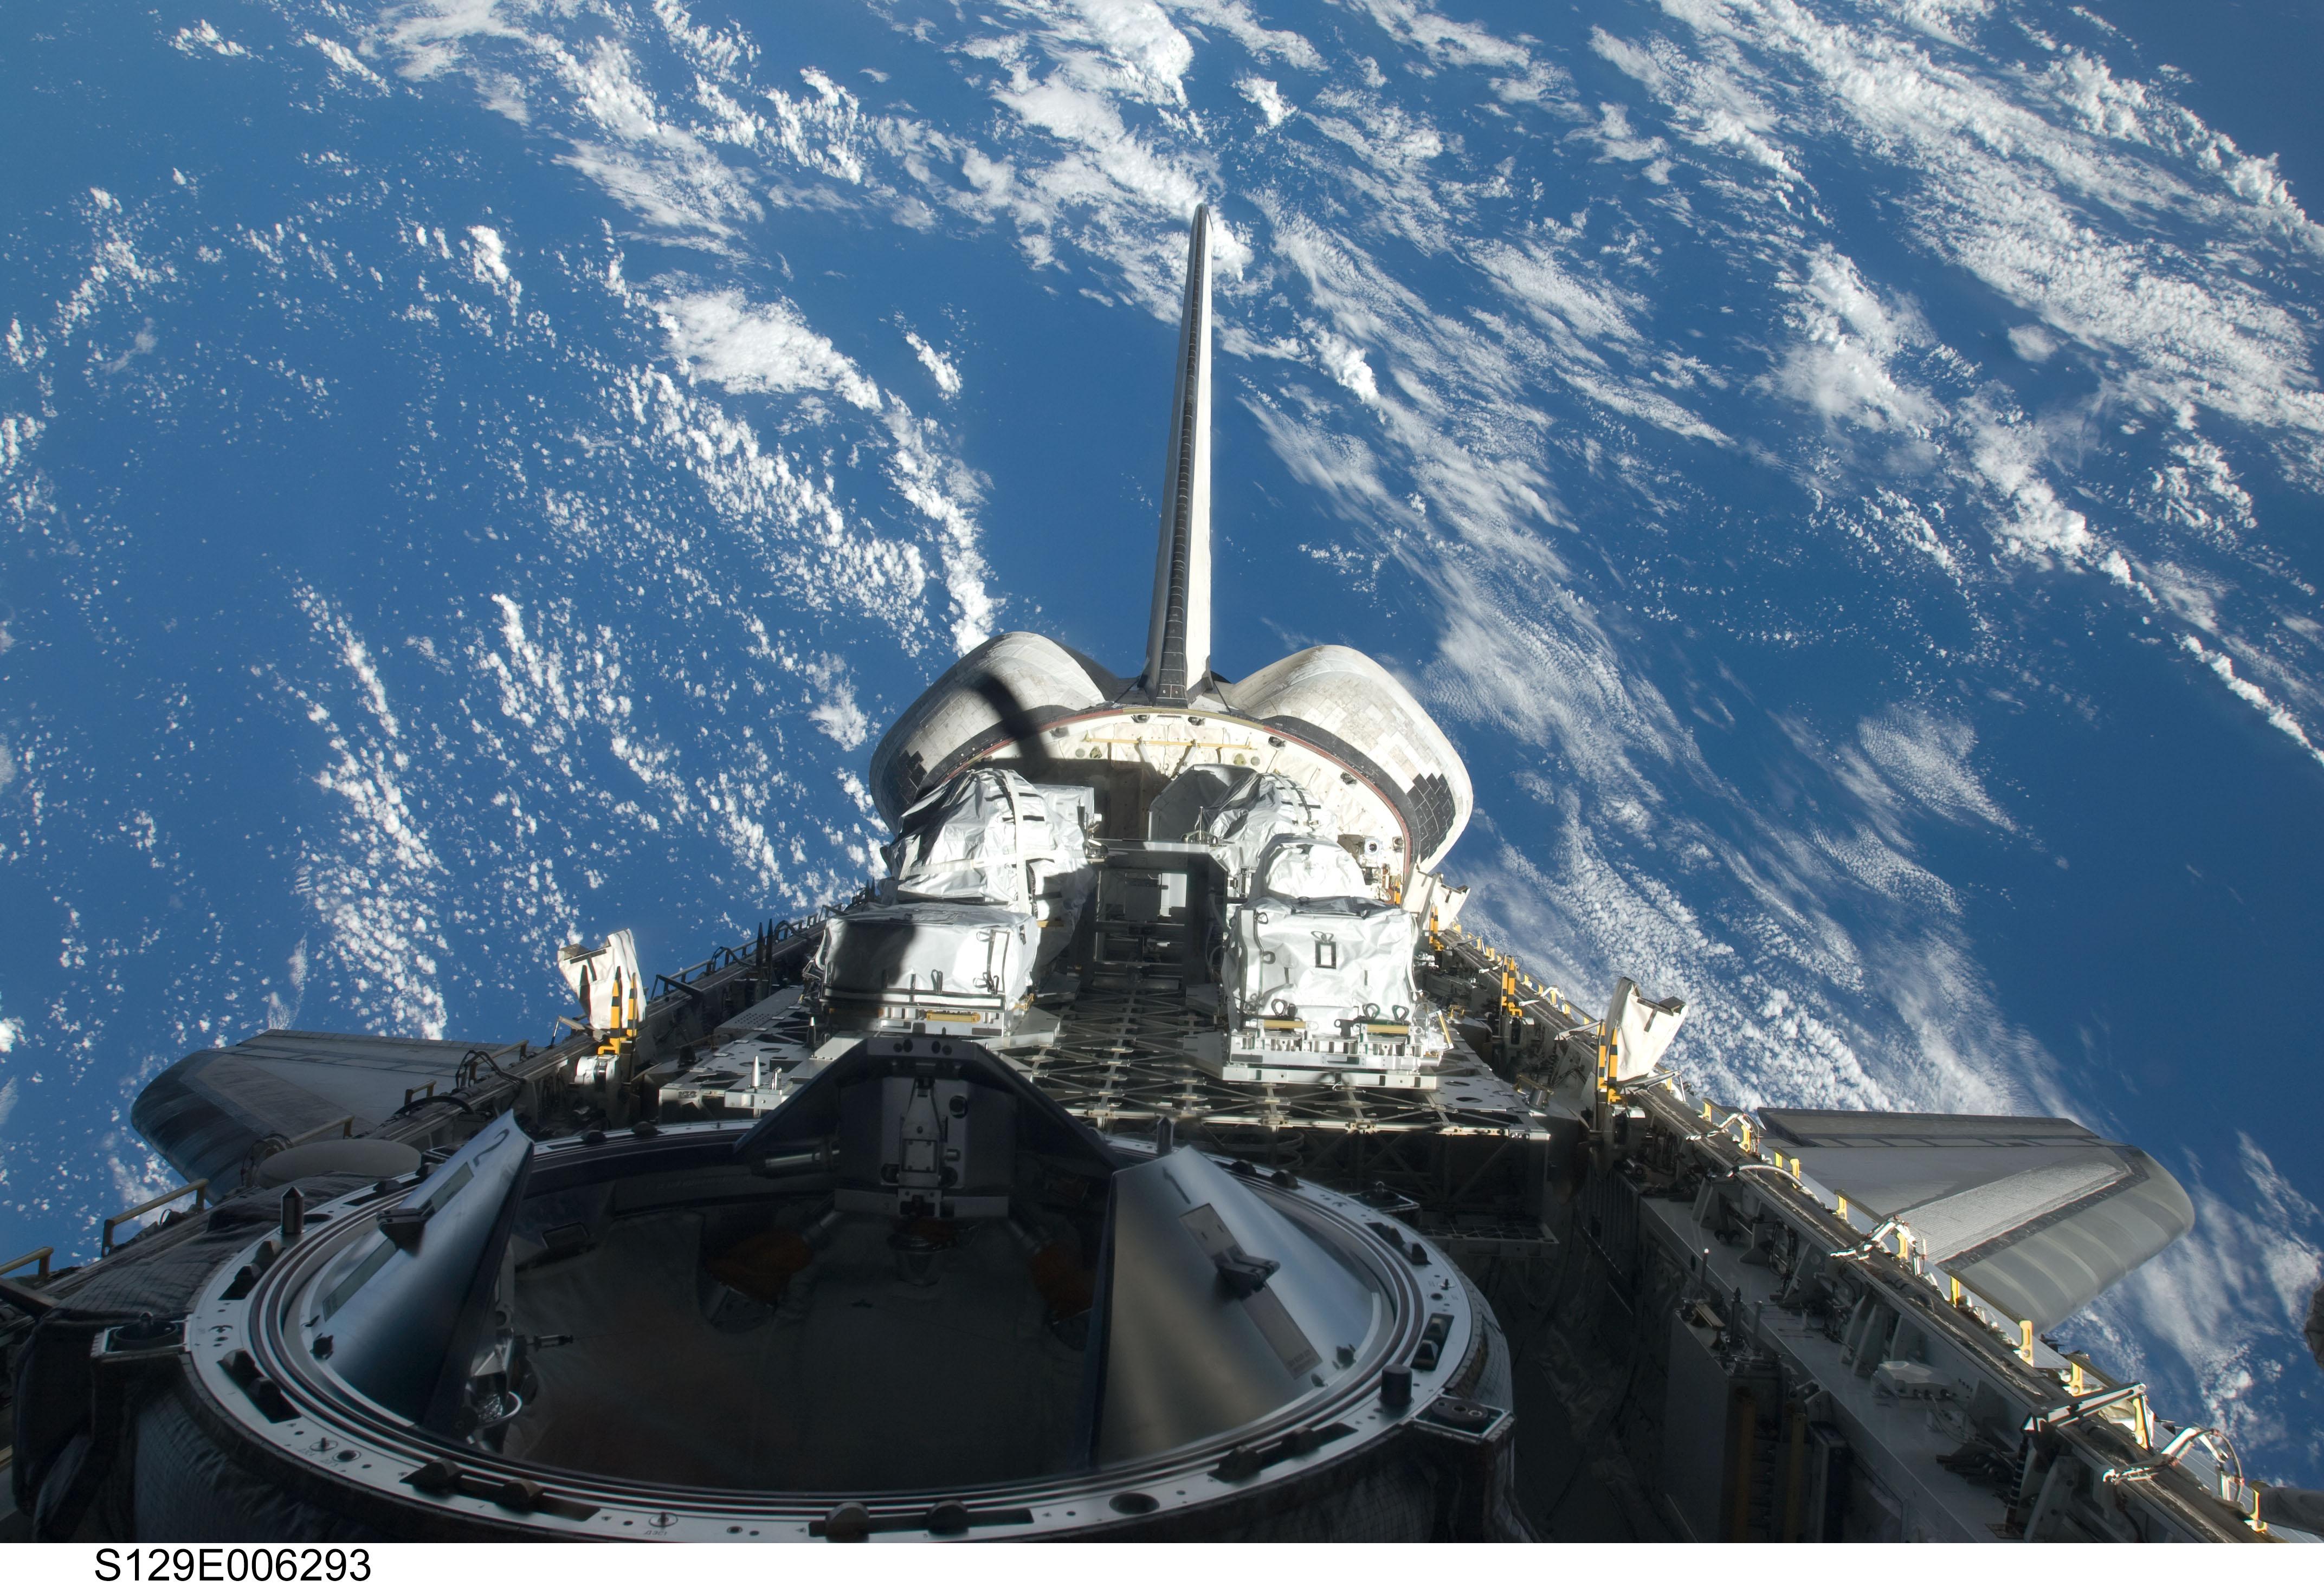 nasa space shuttle in orbit - photo #31